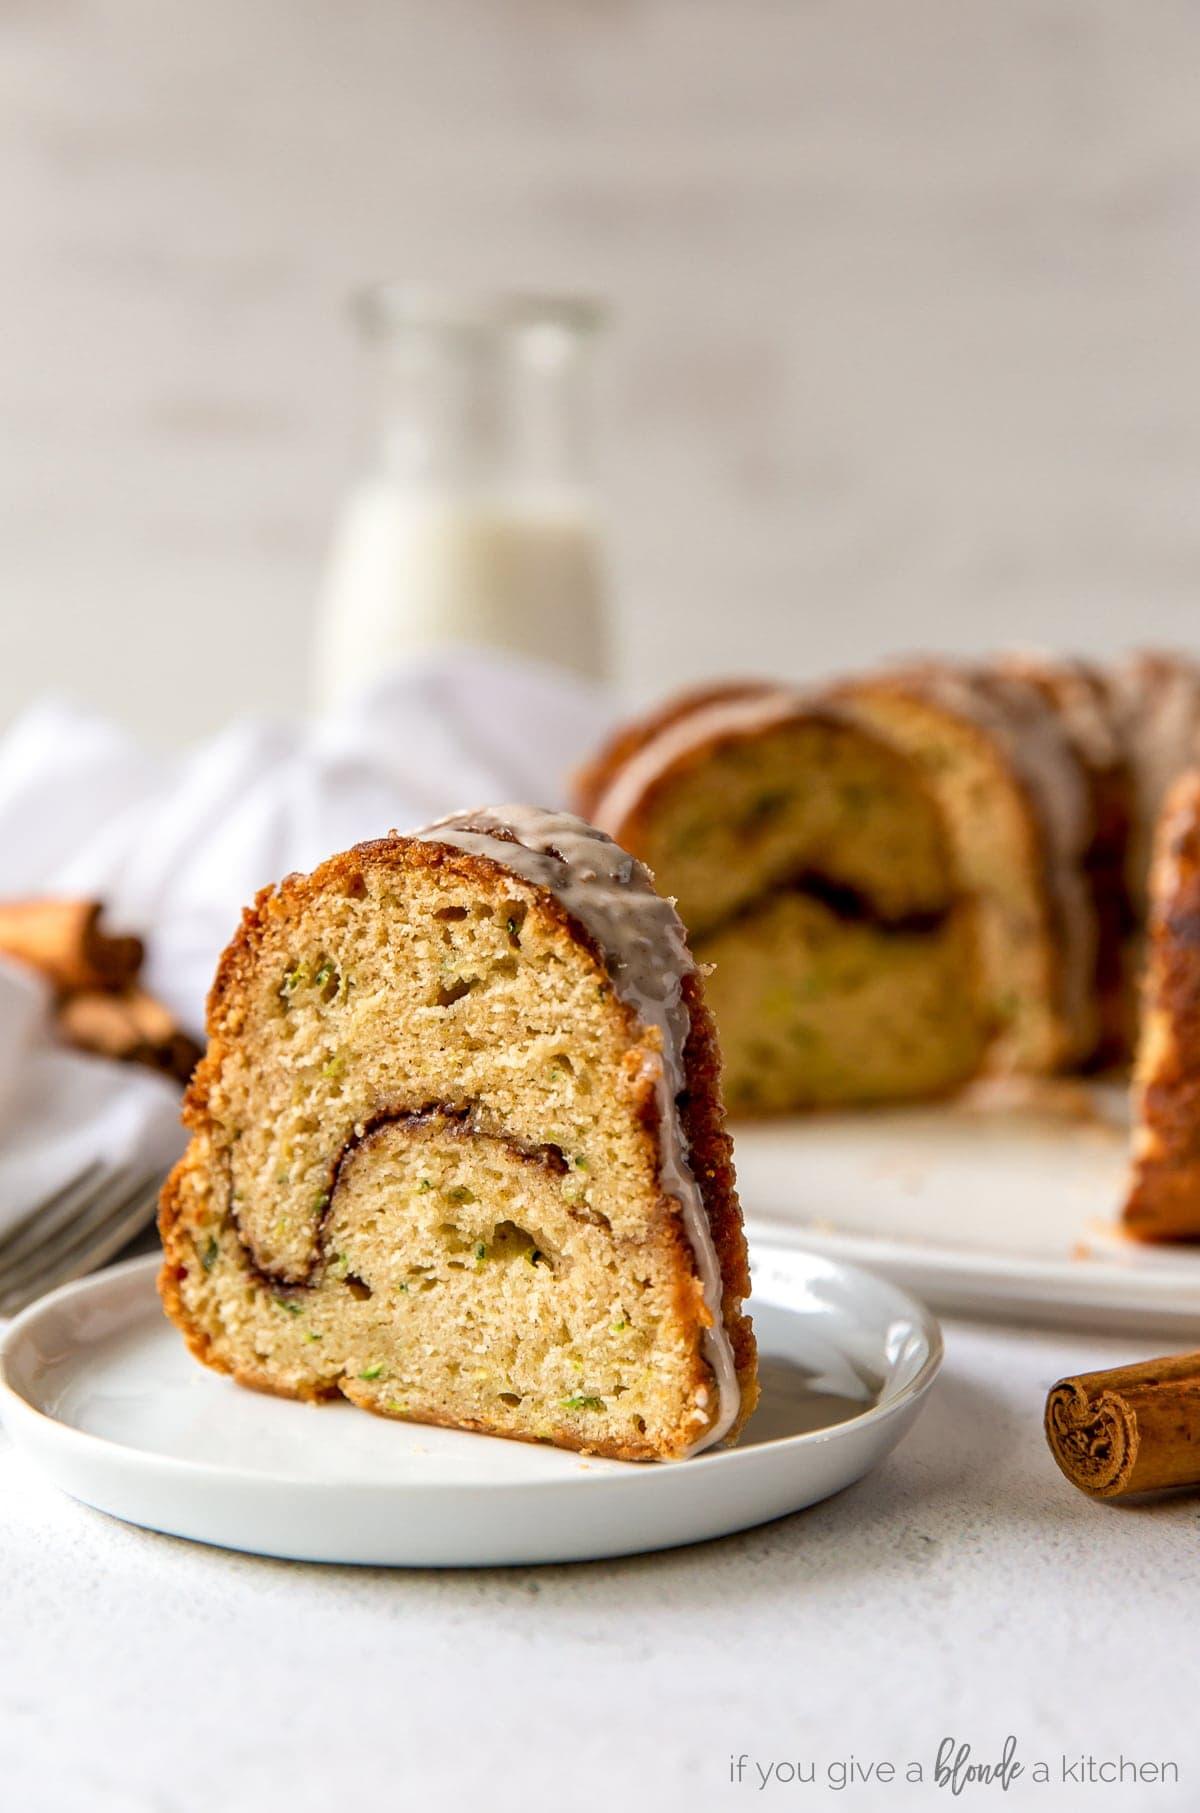 slice of cinnamon zucchini bundt cake with cinnamon swirl in the center